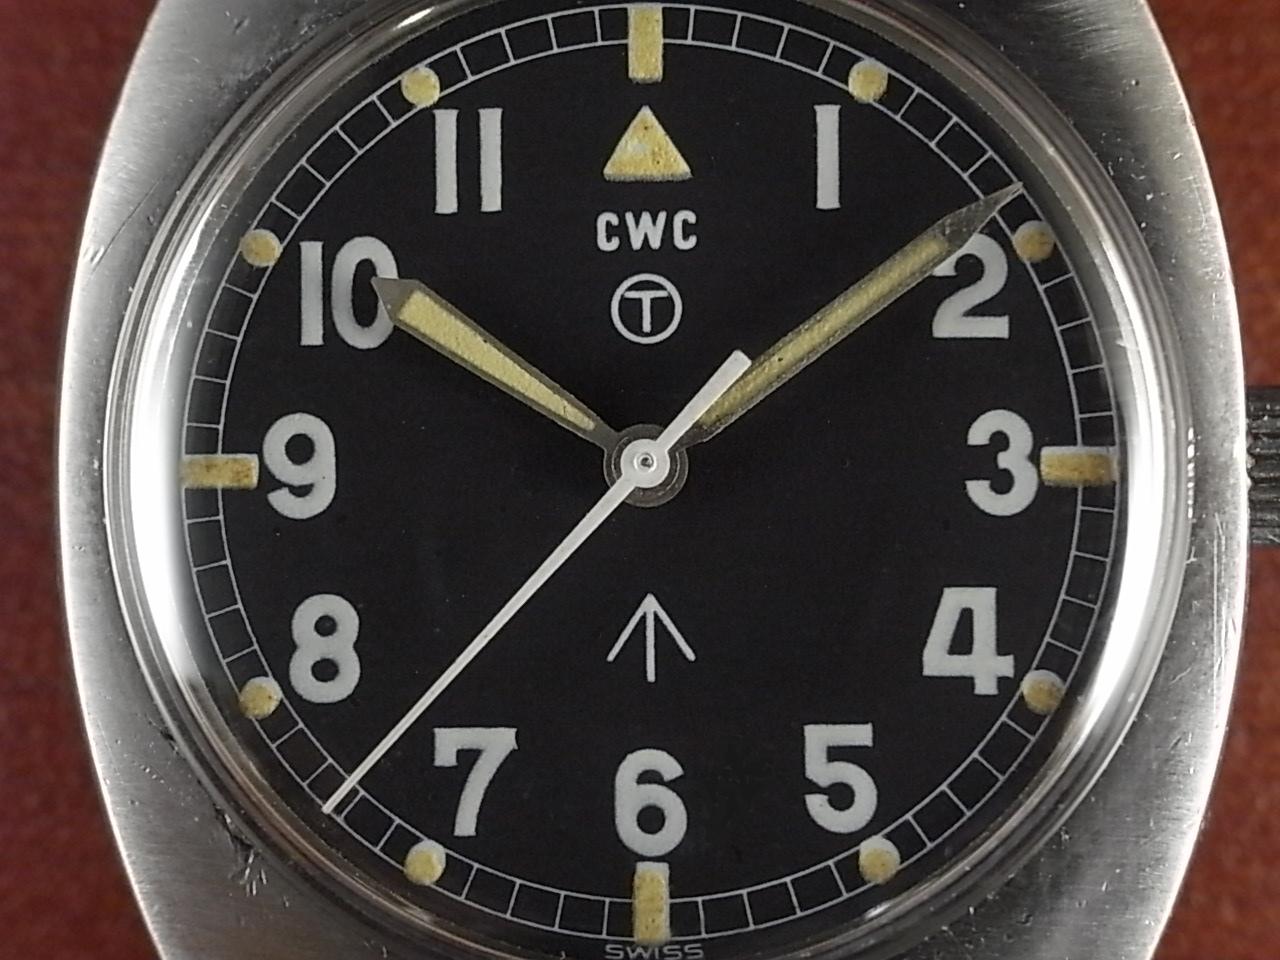 CWC ミリタリー イギリス空軍 6BB  トノーケース 1970年代の写真2枚目